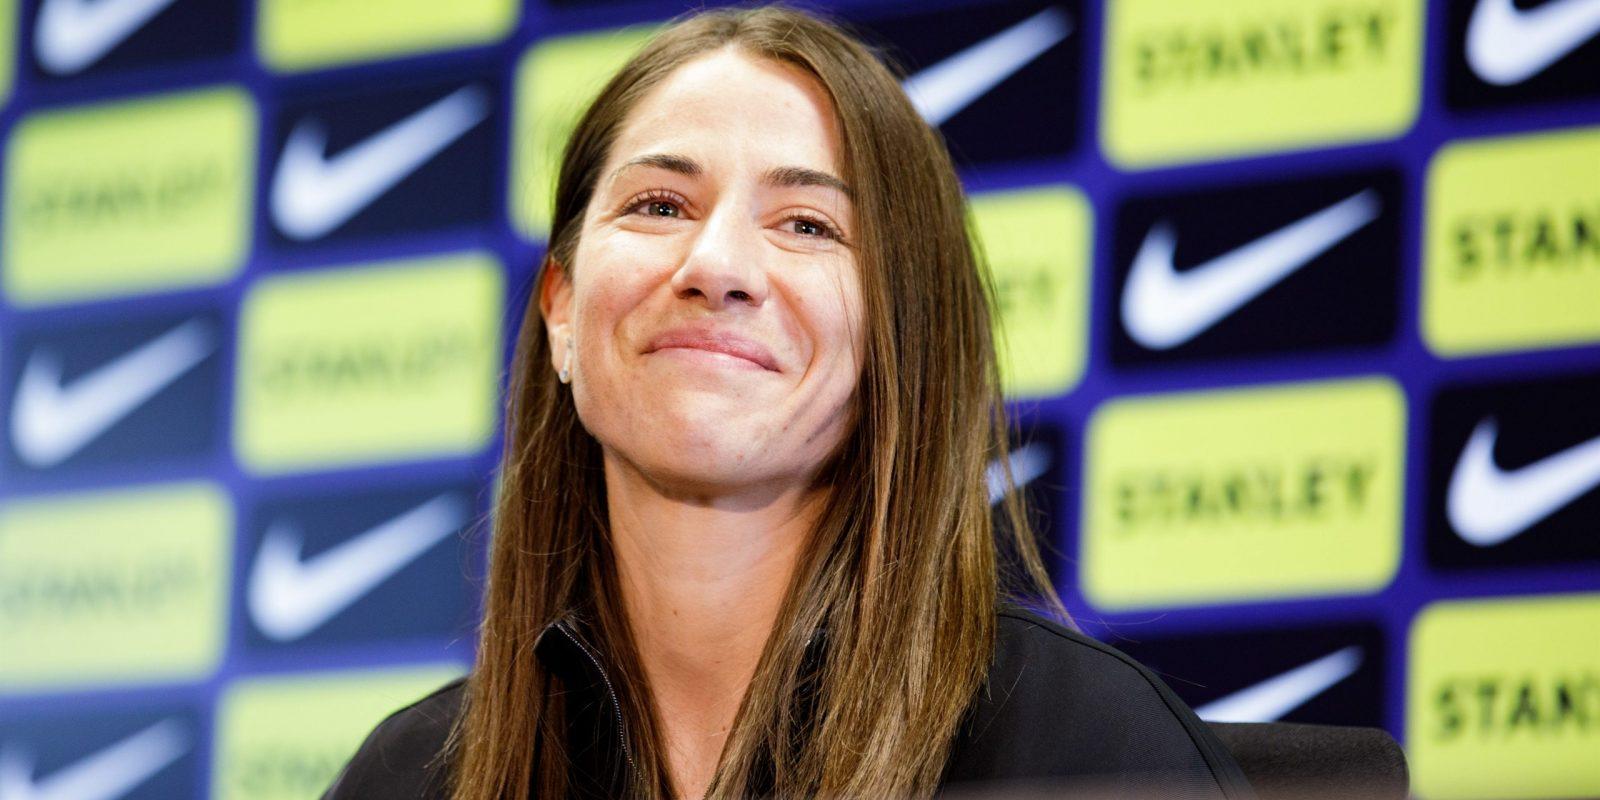 Vicky Losada, exjugadora del Barça | Europa Press